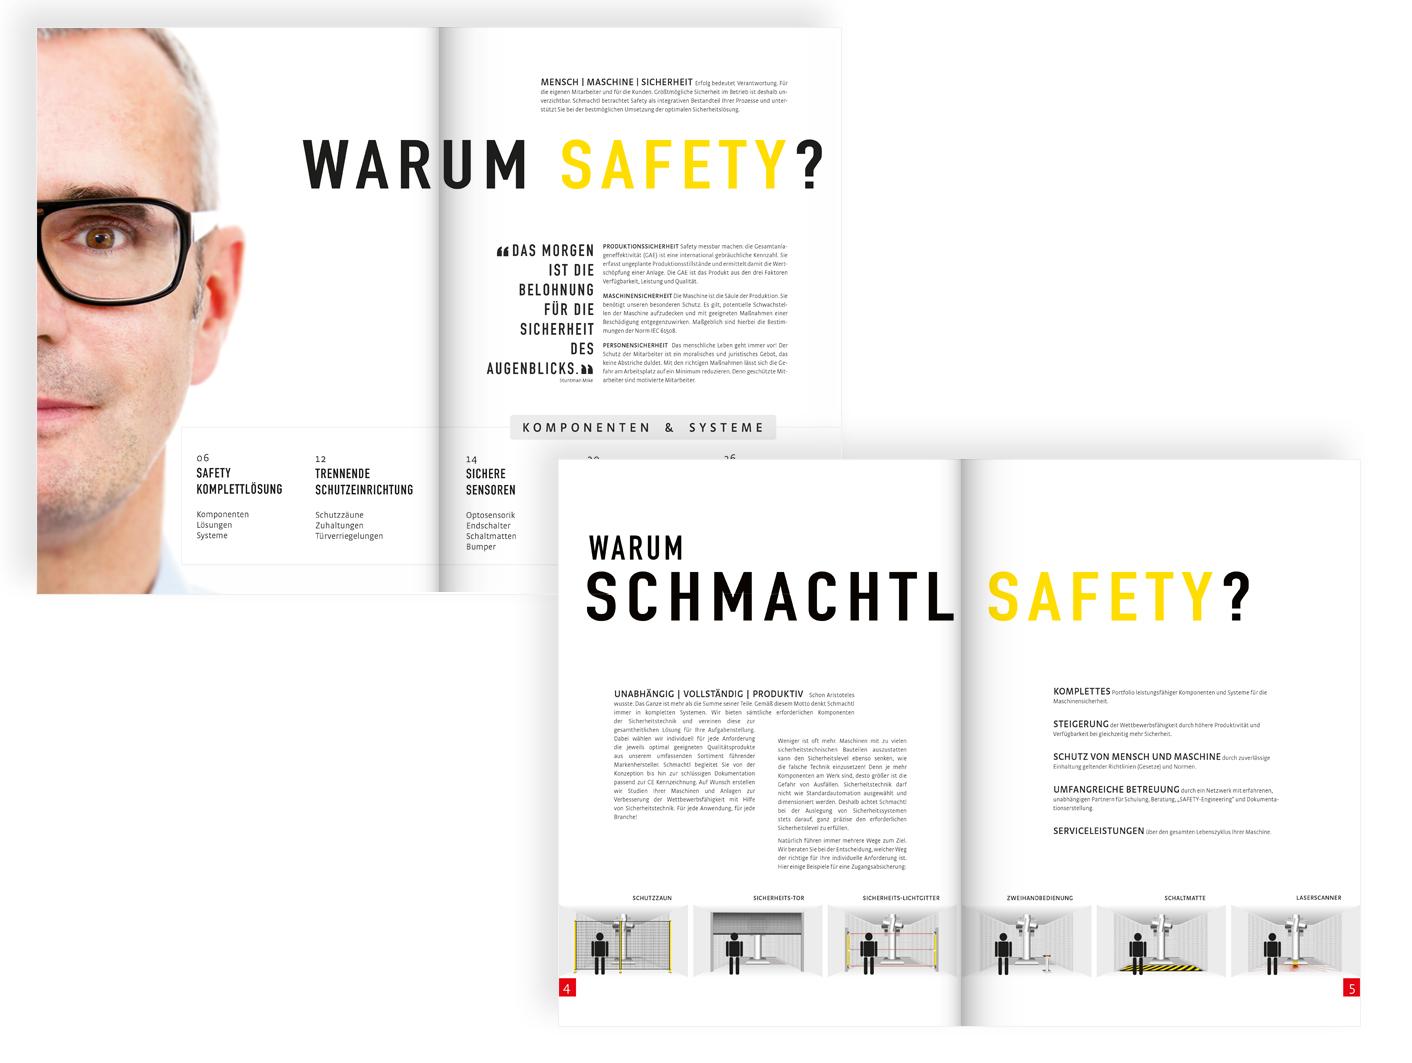 safety02.jpg